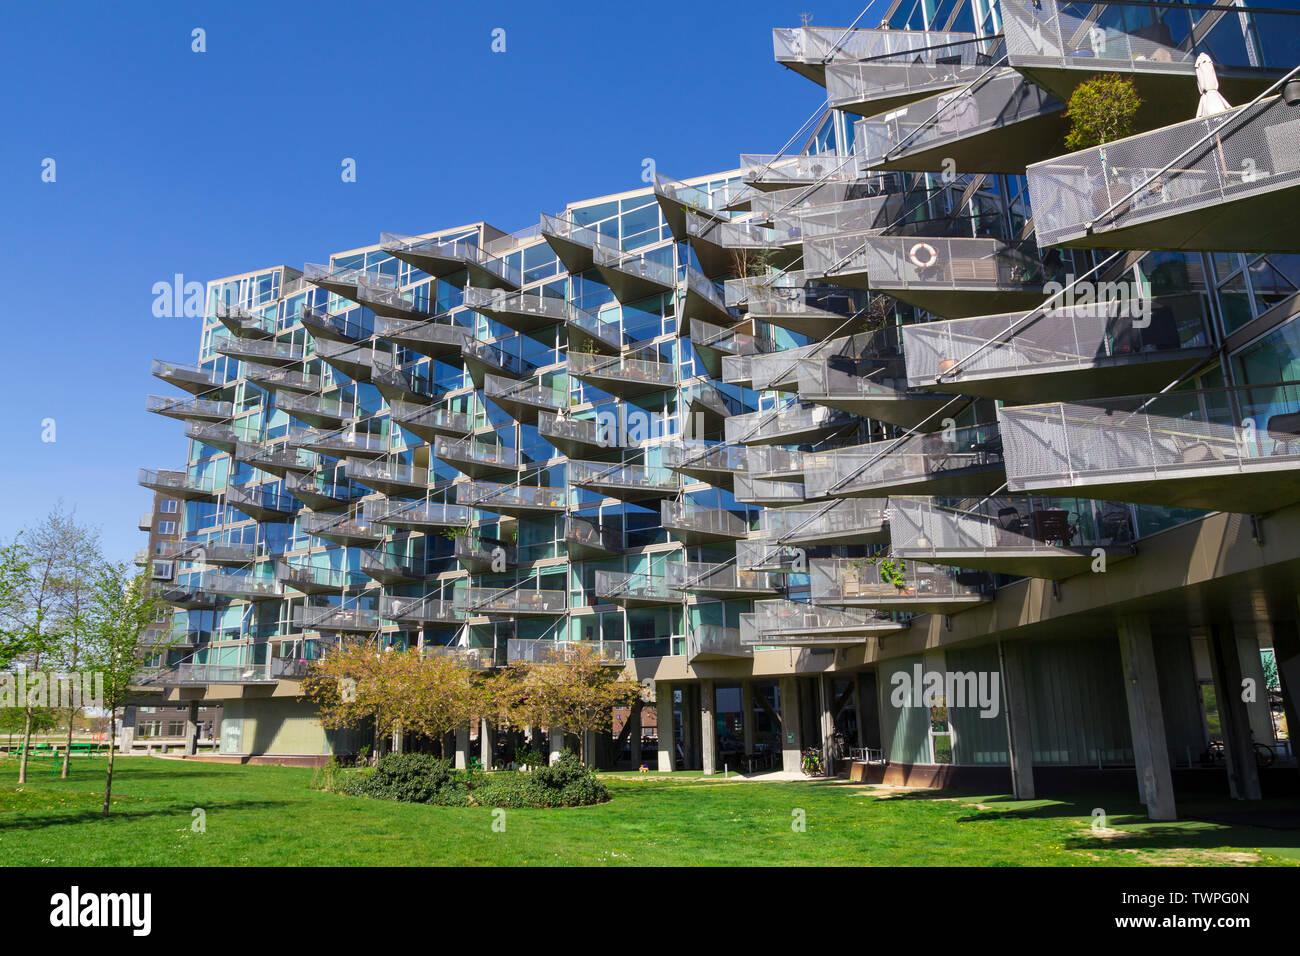 Modern architecture building in Orestad, Copenhagen, with triangular balconies in a glass facade Stock Photo